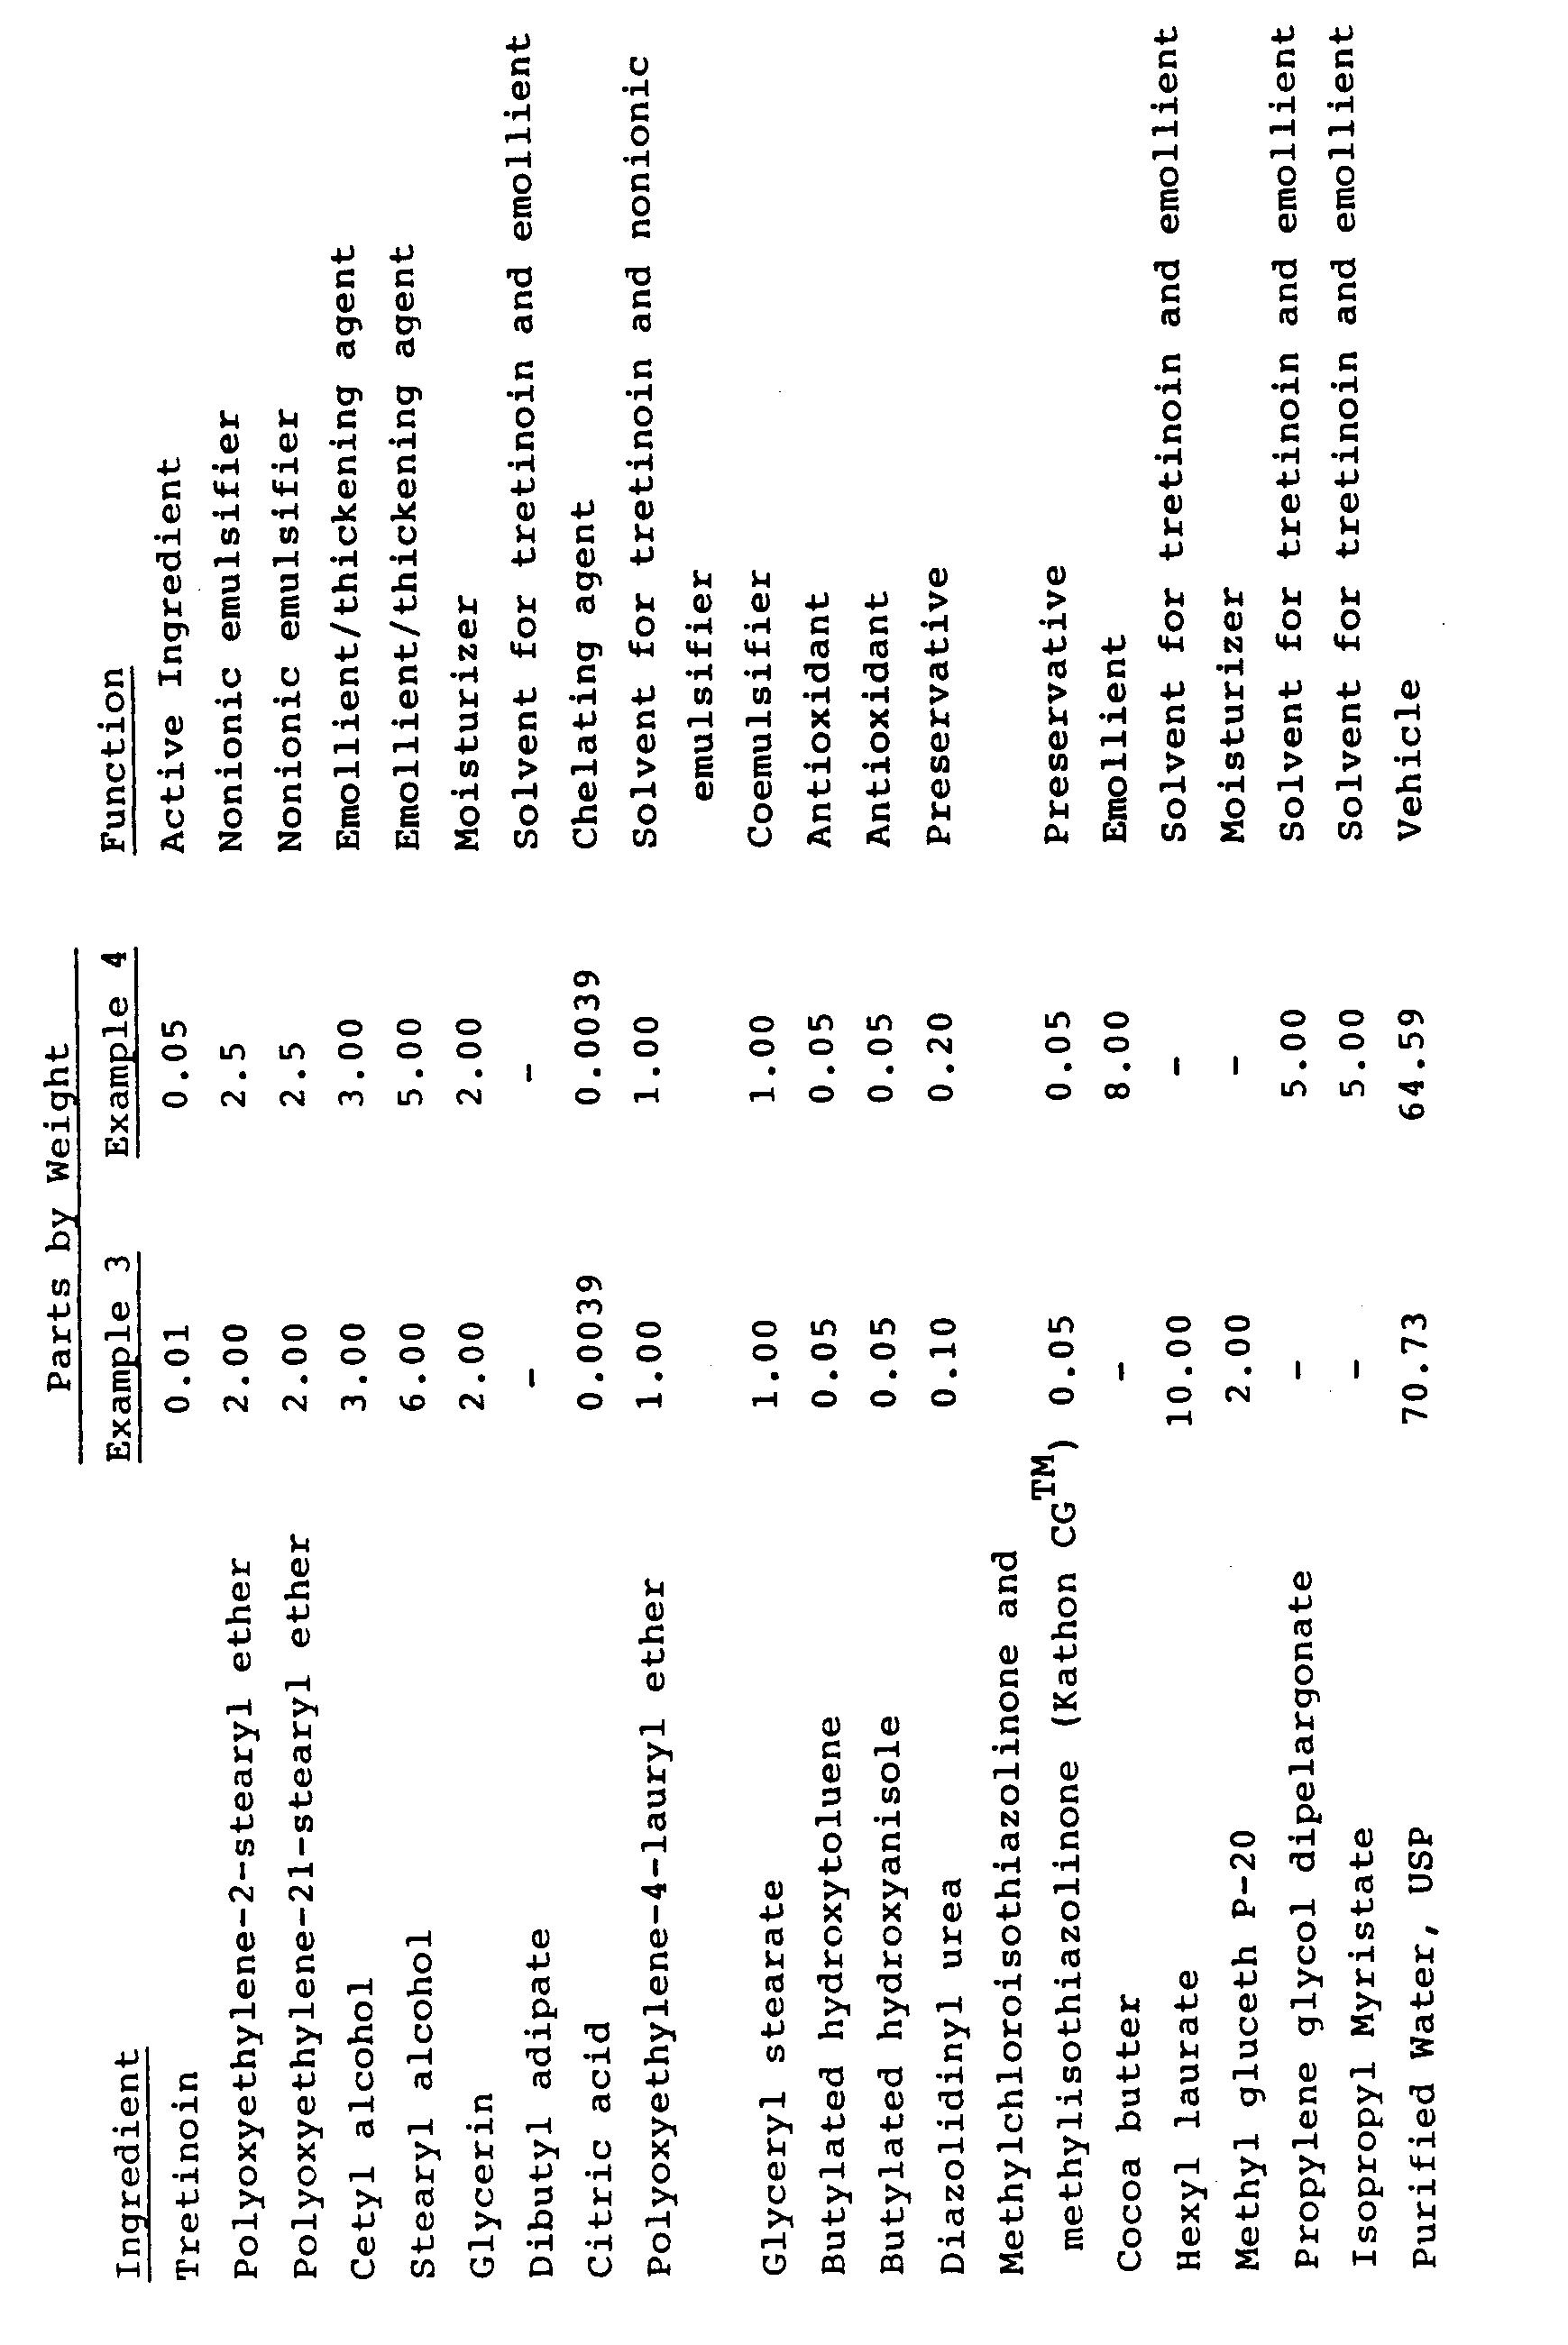 EP0408370B1 - Stable tretinoin emulsified cream formulations